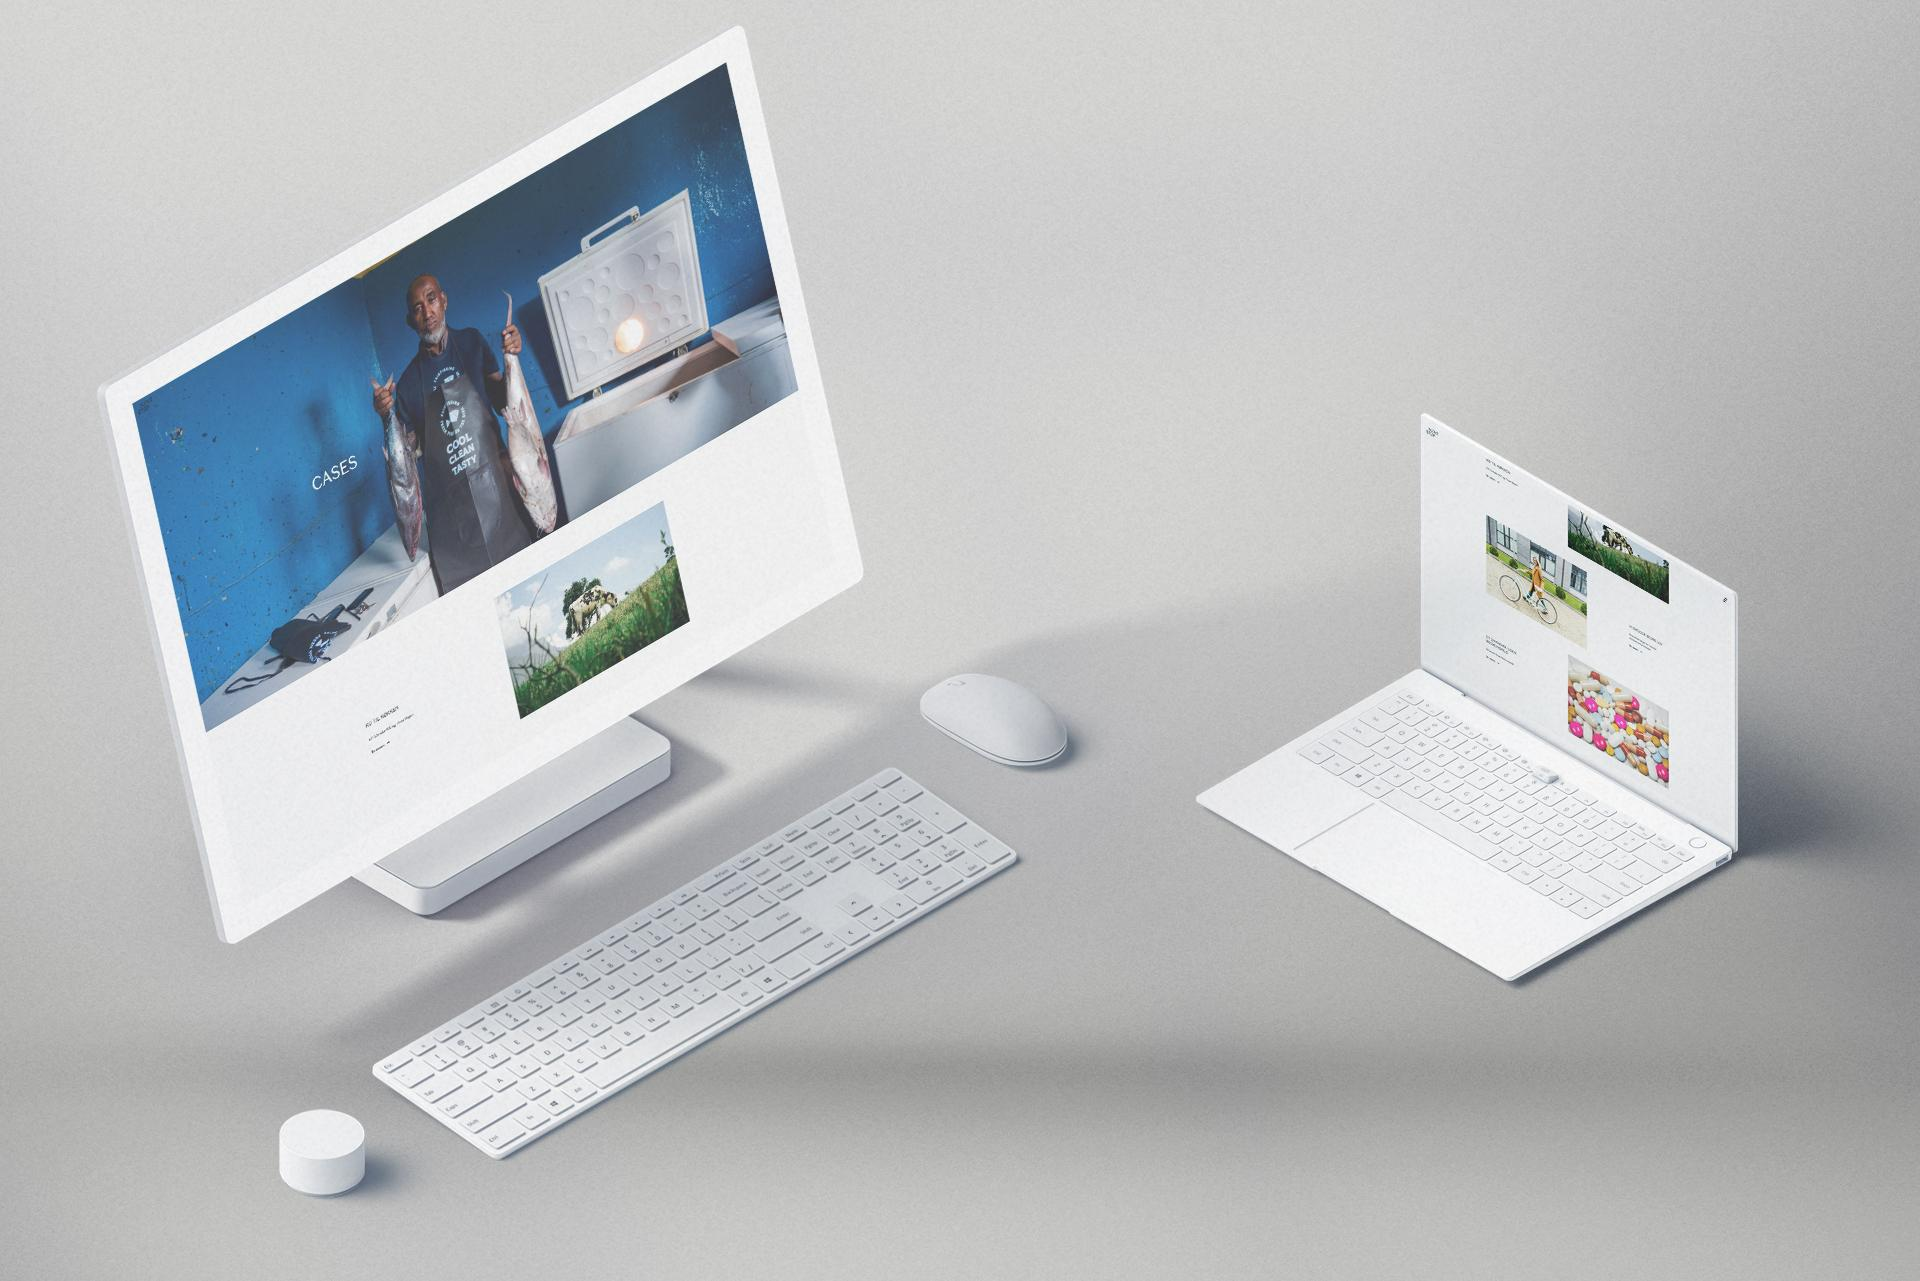 Nextstep website displayed on Surface Studio and Matebook X Pro.